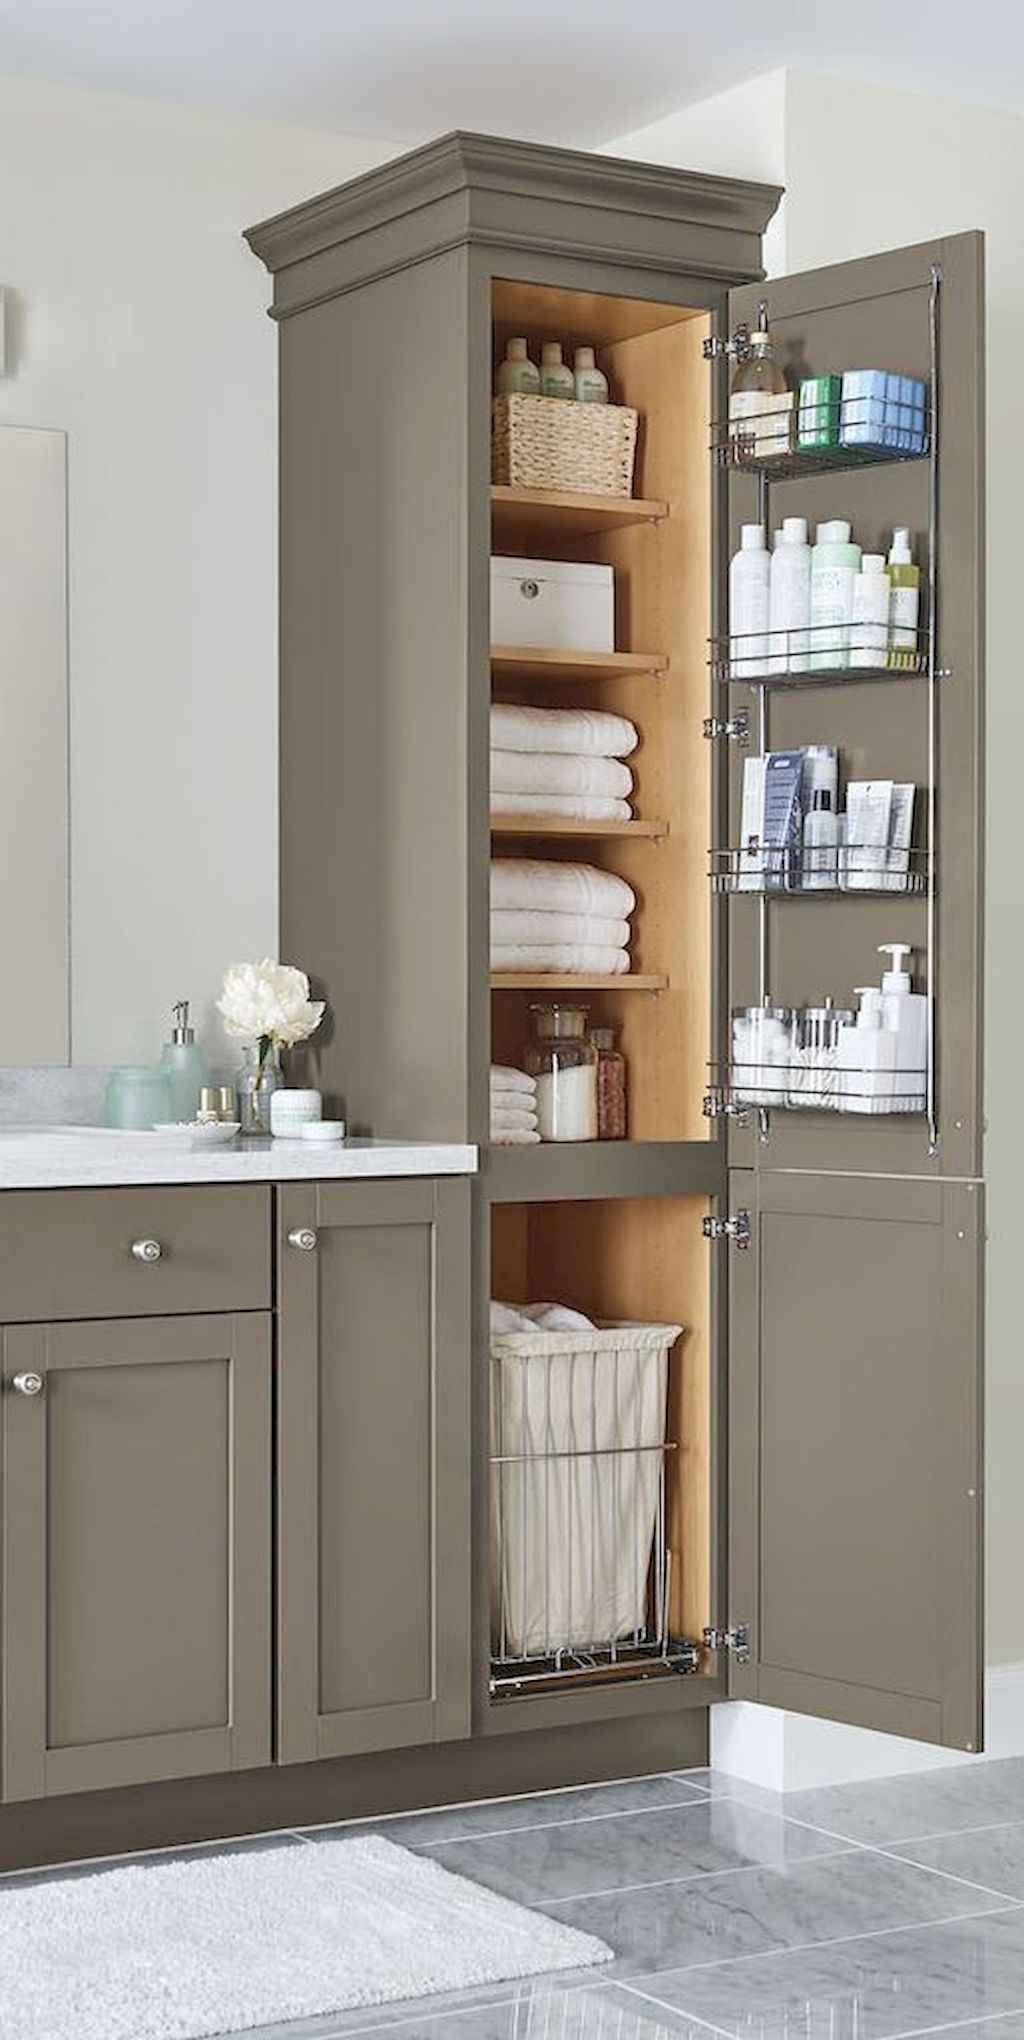 Inspiring apartment bathroom remodel ideas on a budget (1)